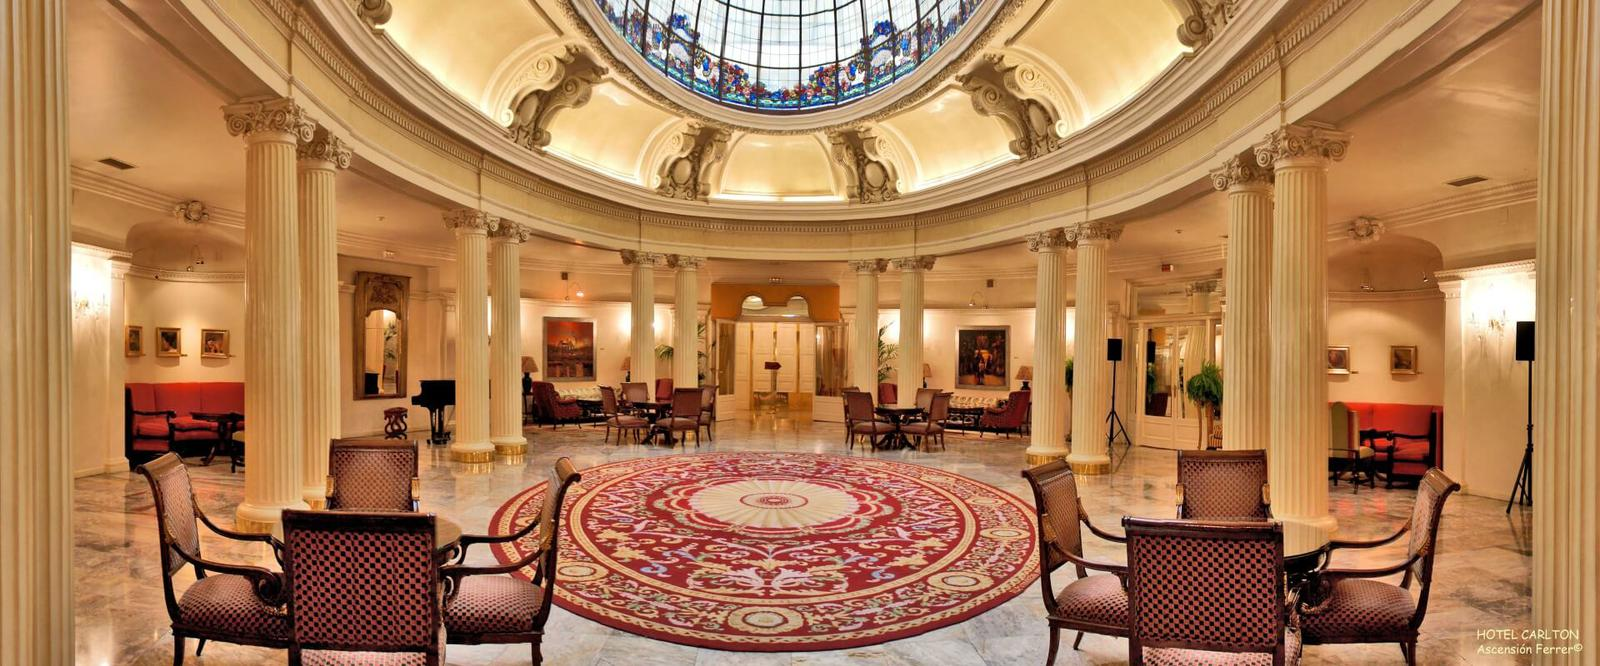 Hall - Hotel Carlton Bilbao